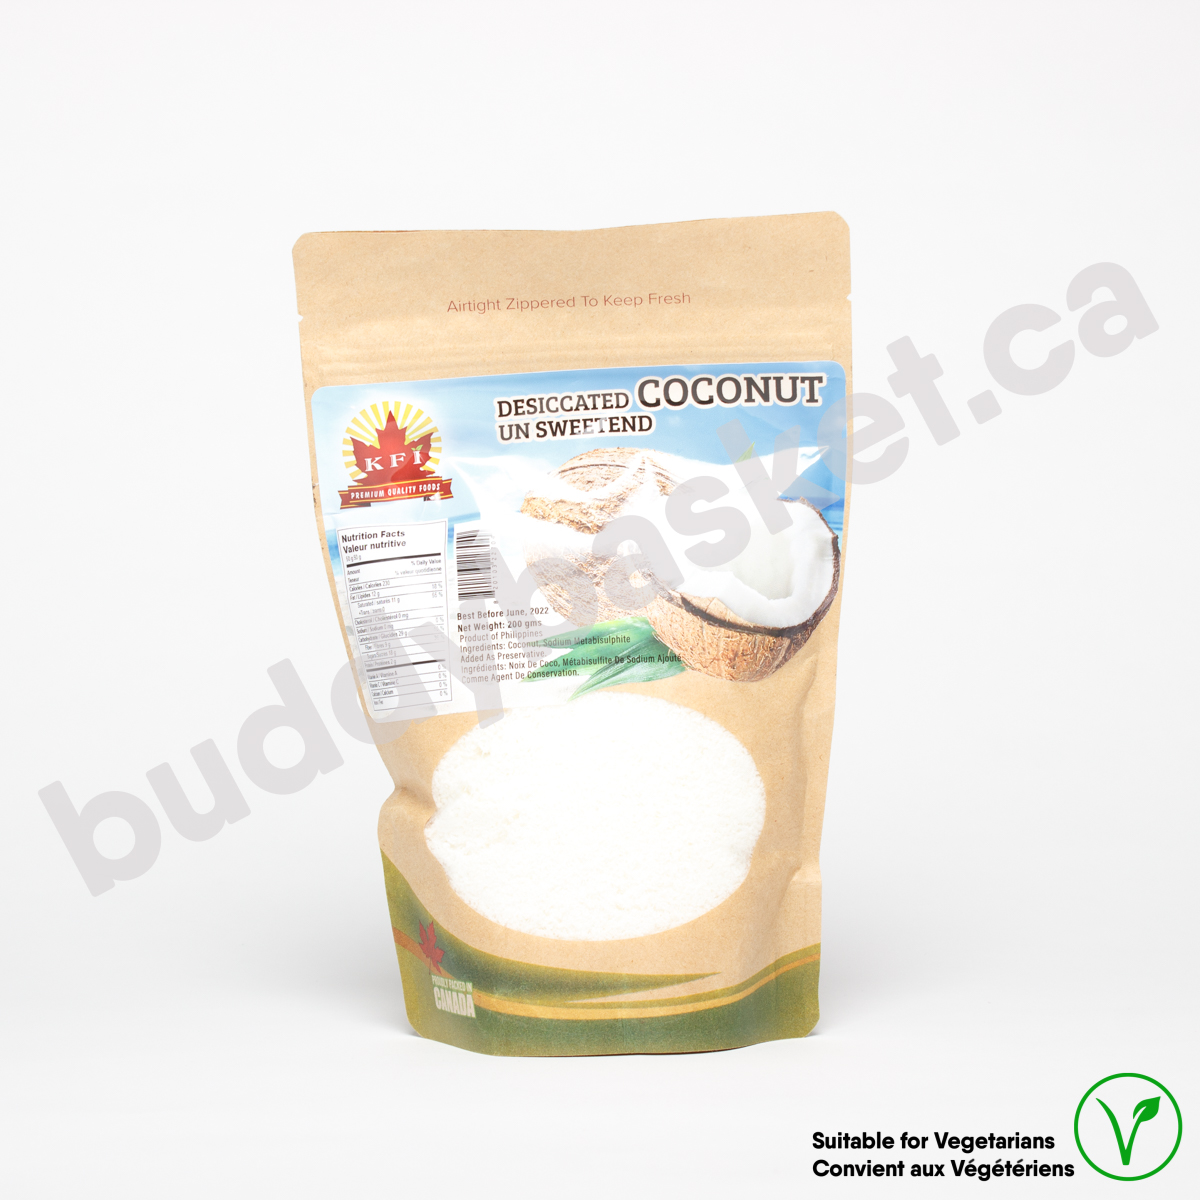 KFI Coconut Dessicated 400g